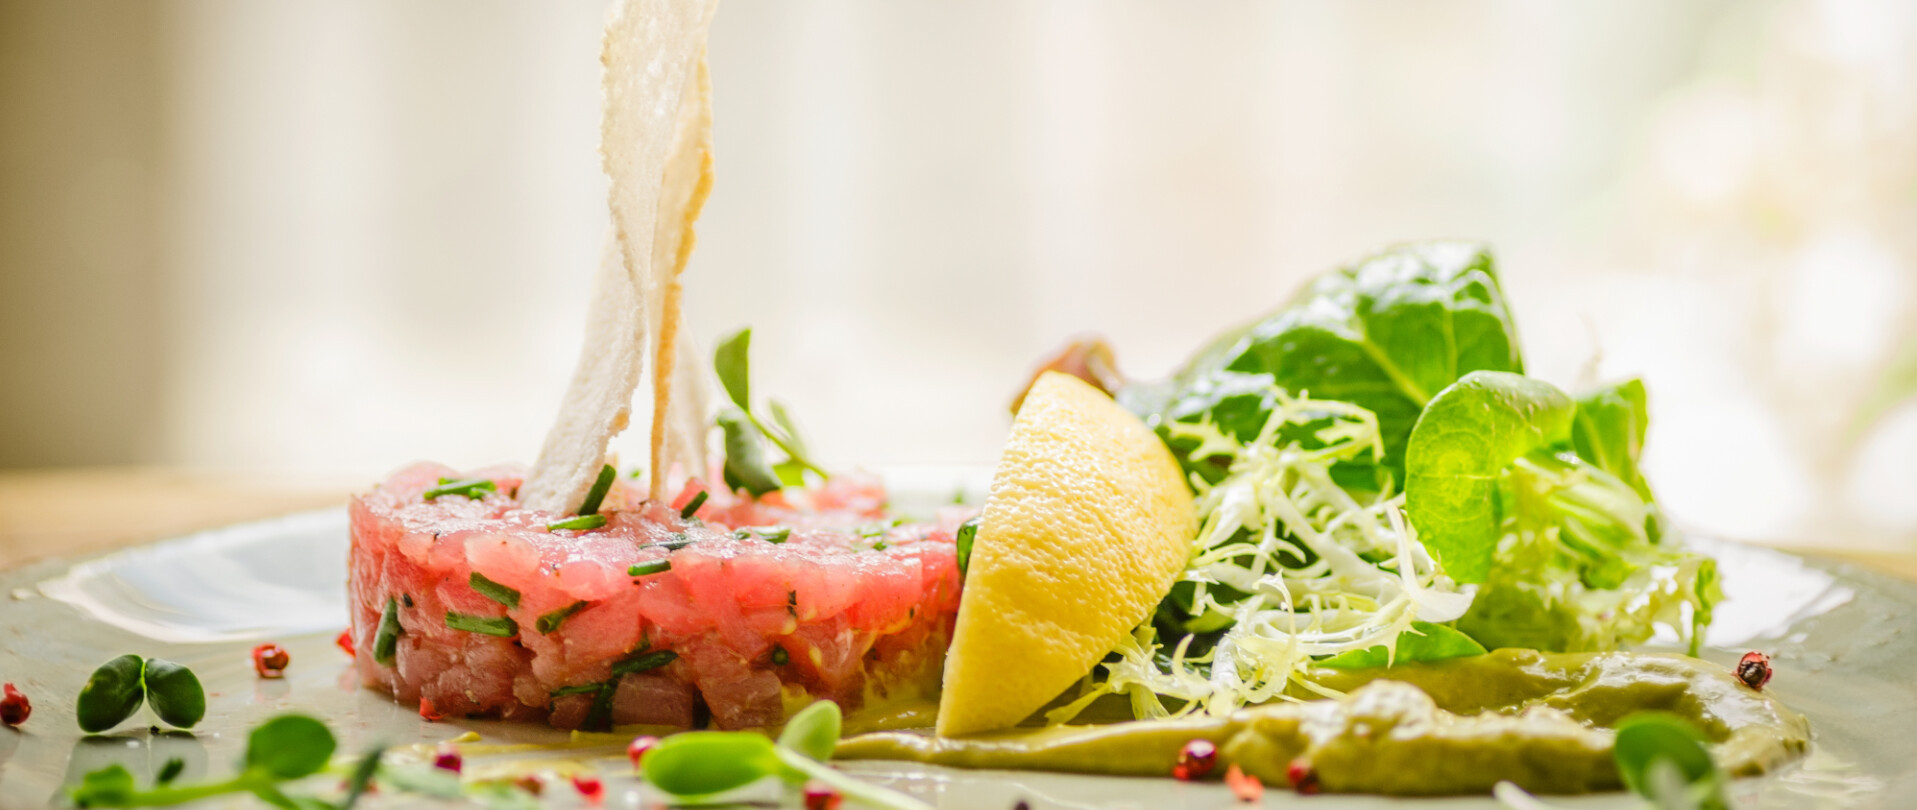 Meet North Star's talented chef, Leigh Kooiker photo 1